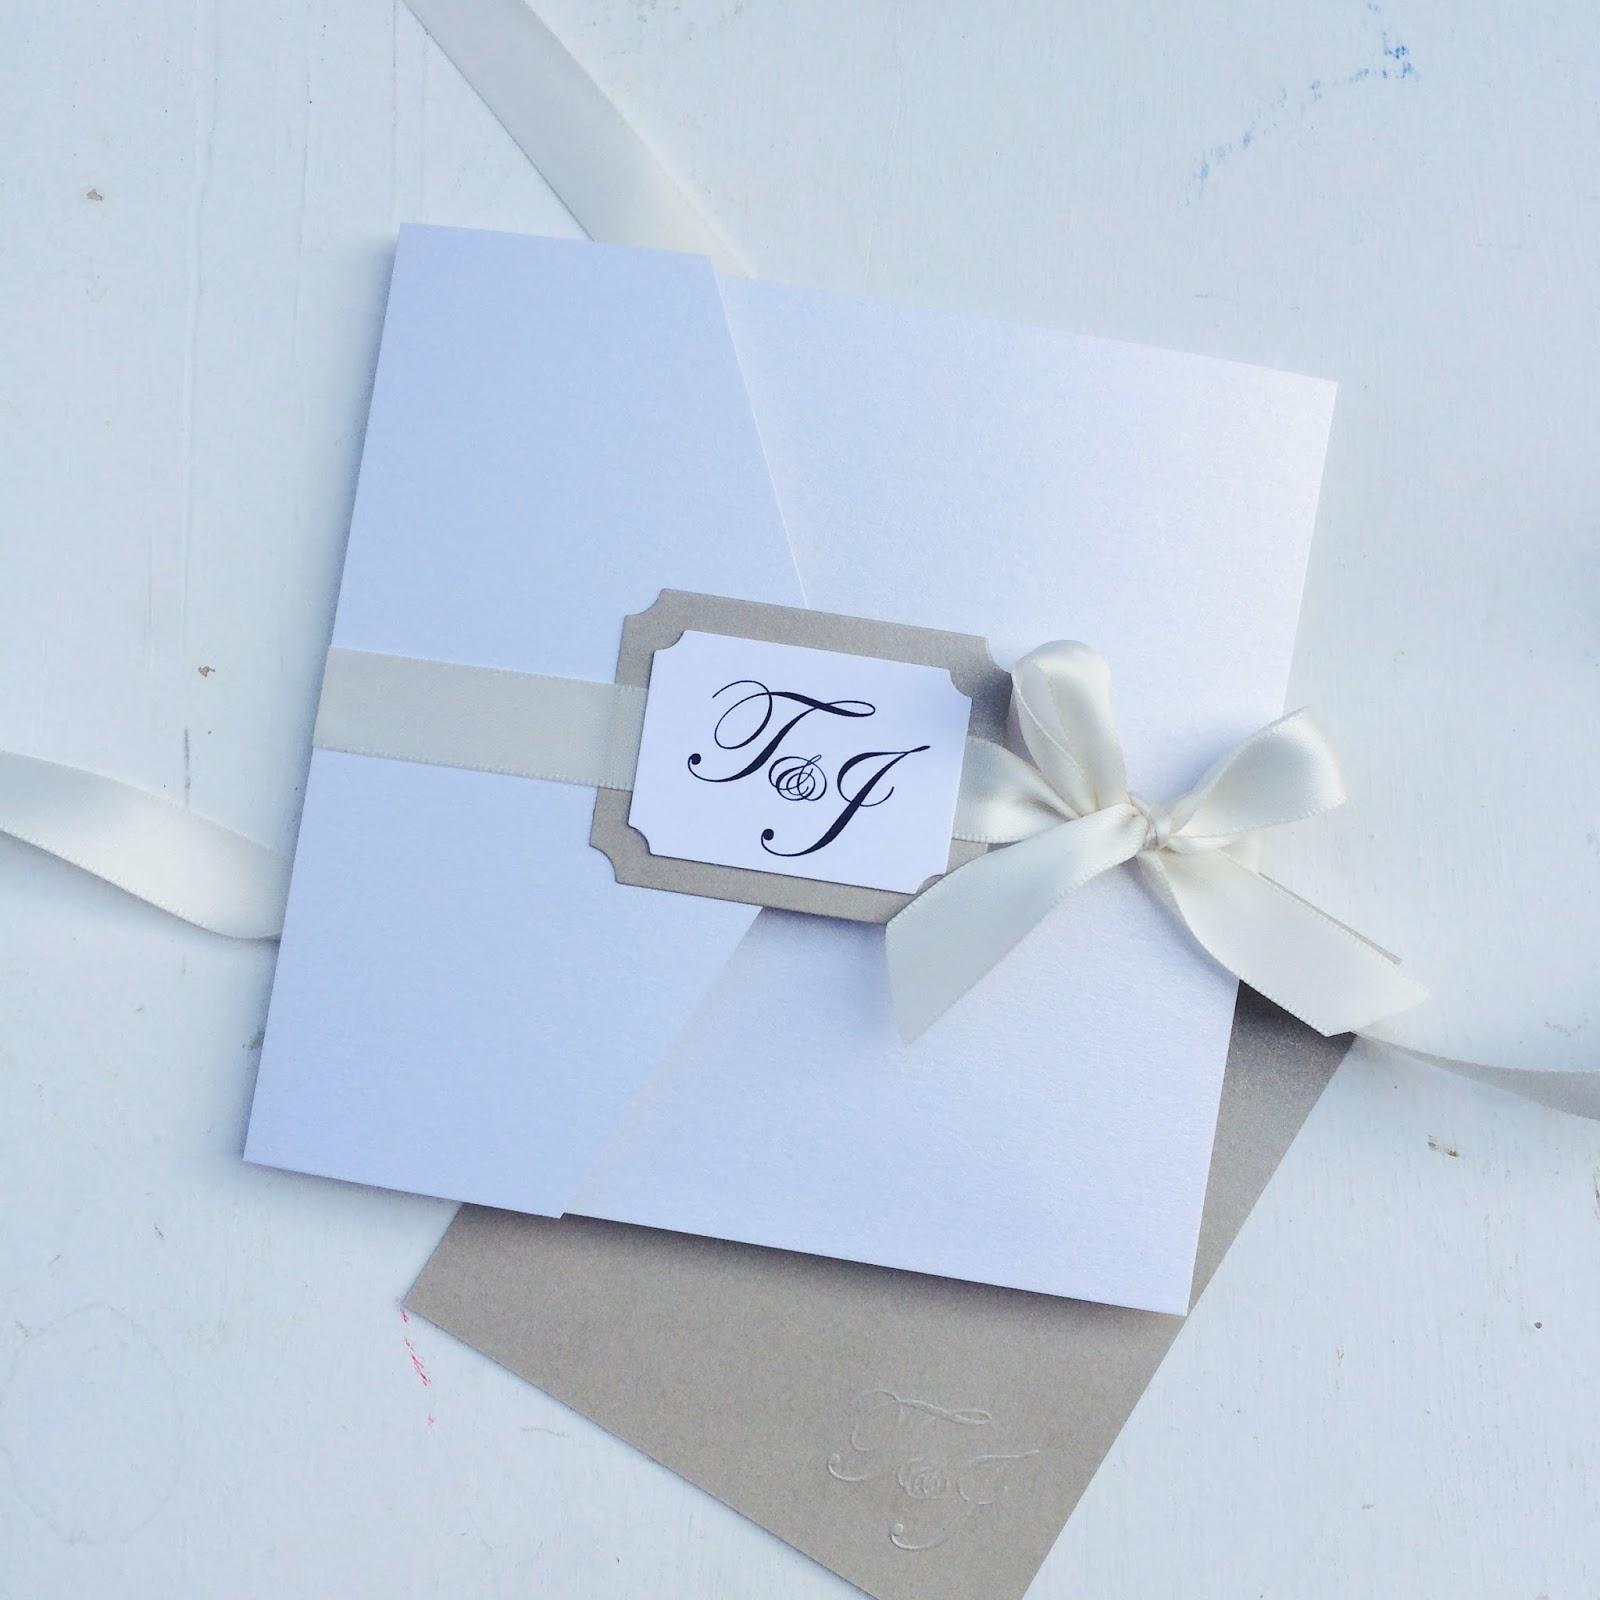 samey atelier farbstil klassich elegante einladungkarte. Black Bedroom Furniture Sets. Home Design Ideas